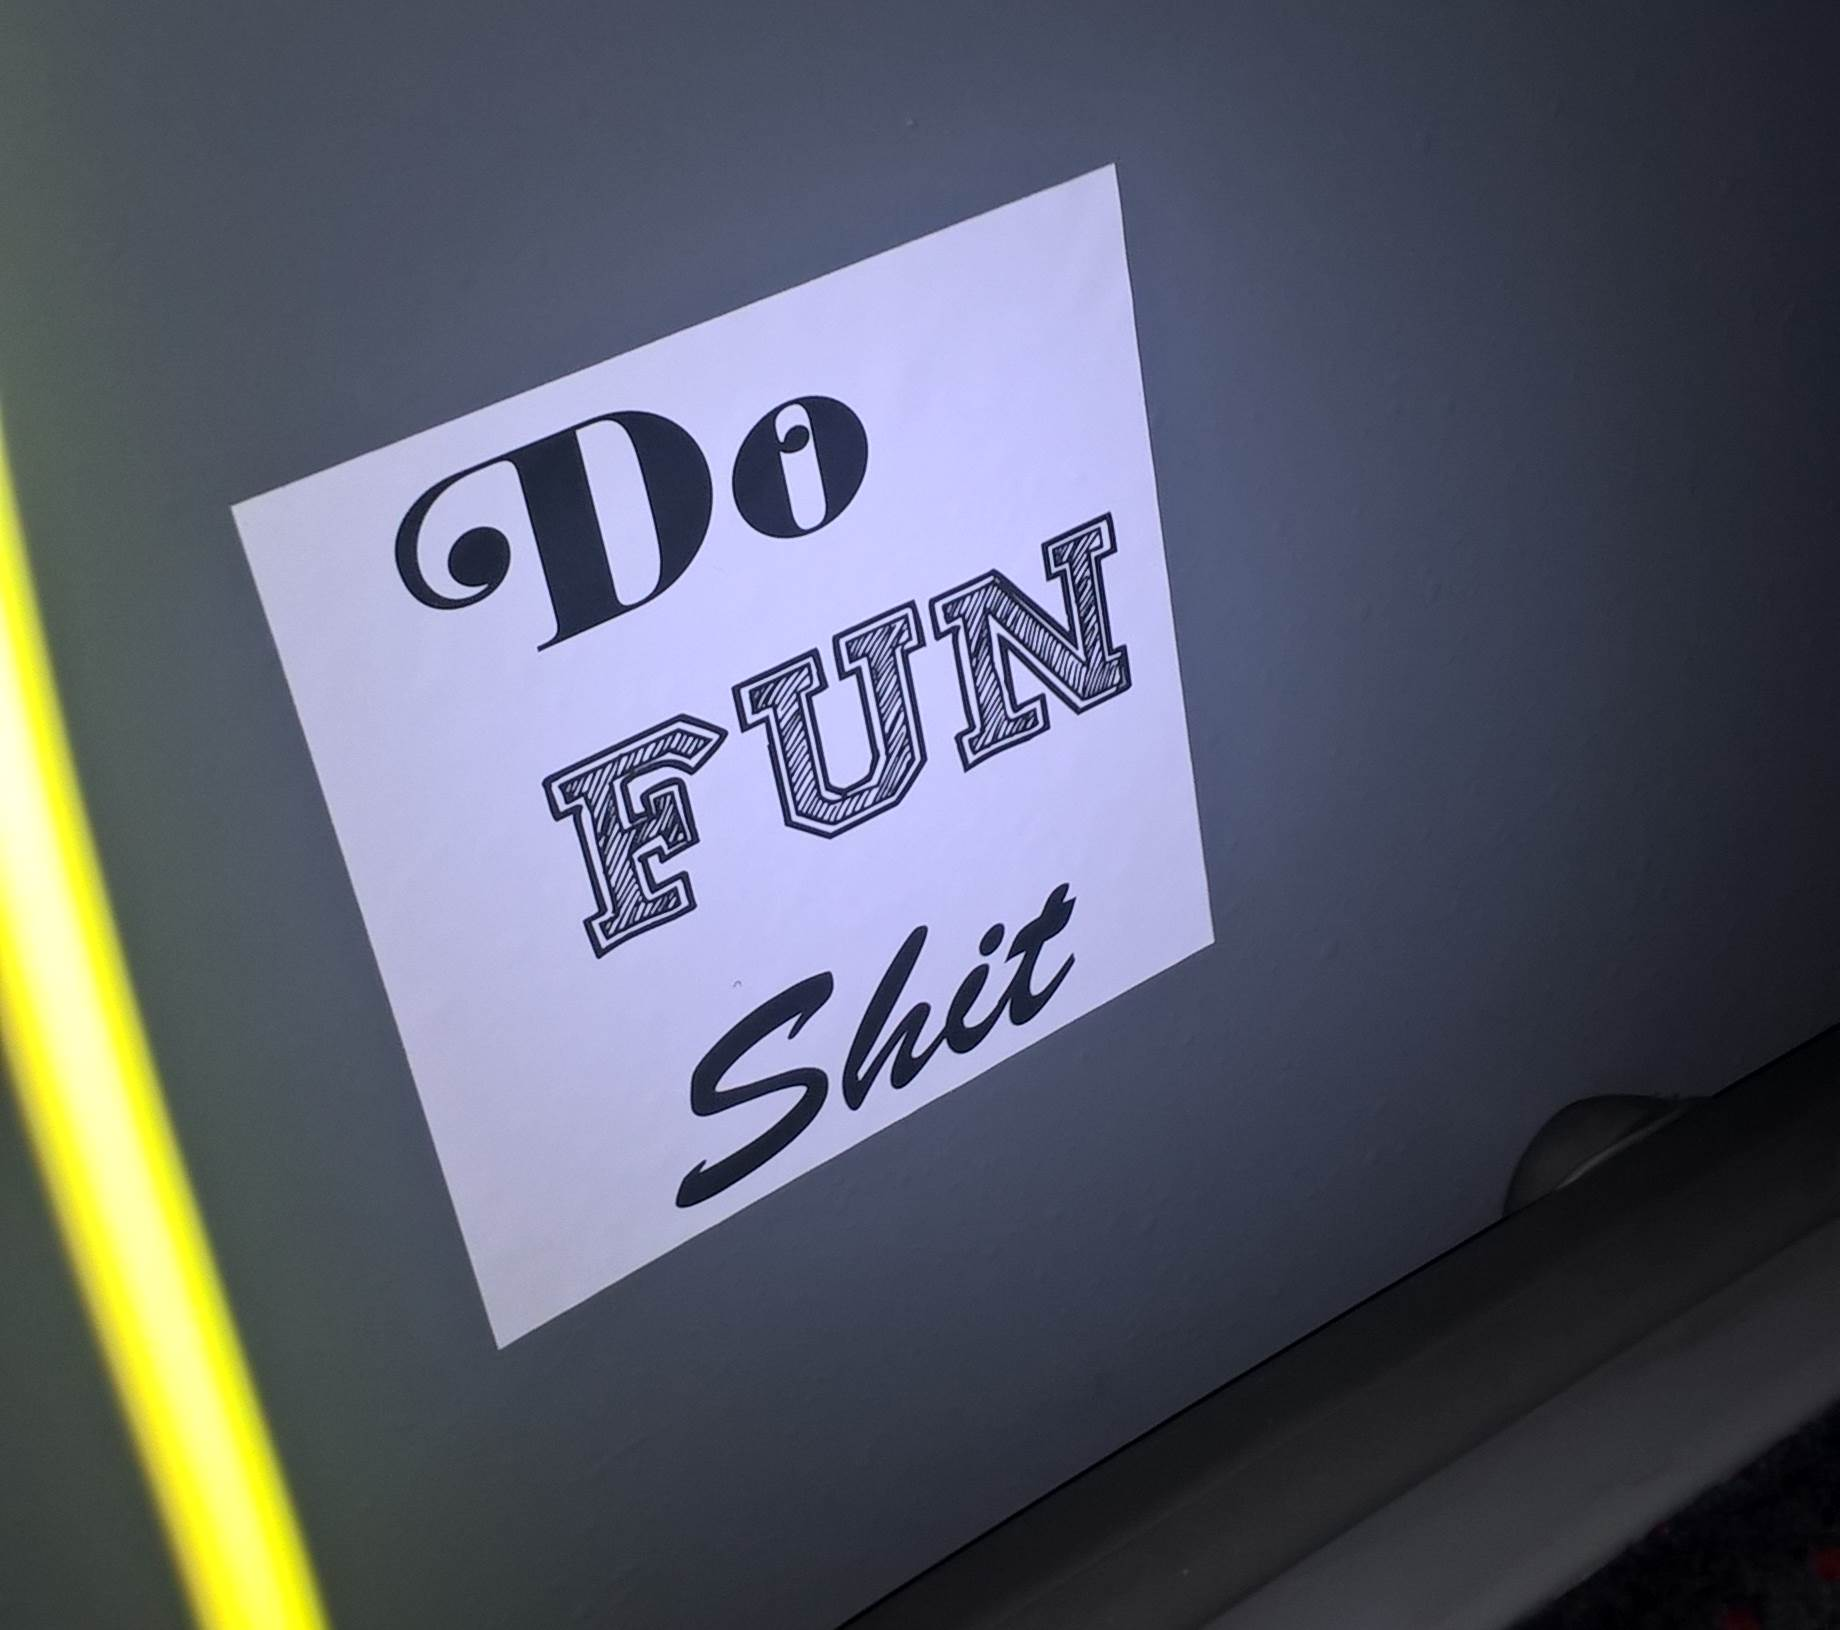 do-fun-shit